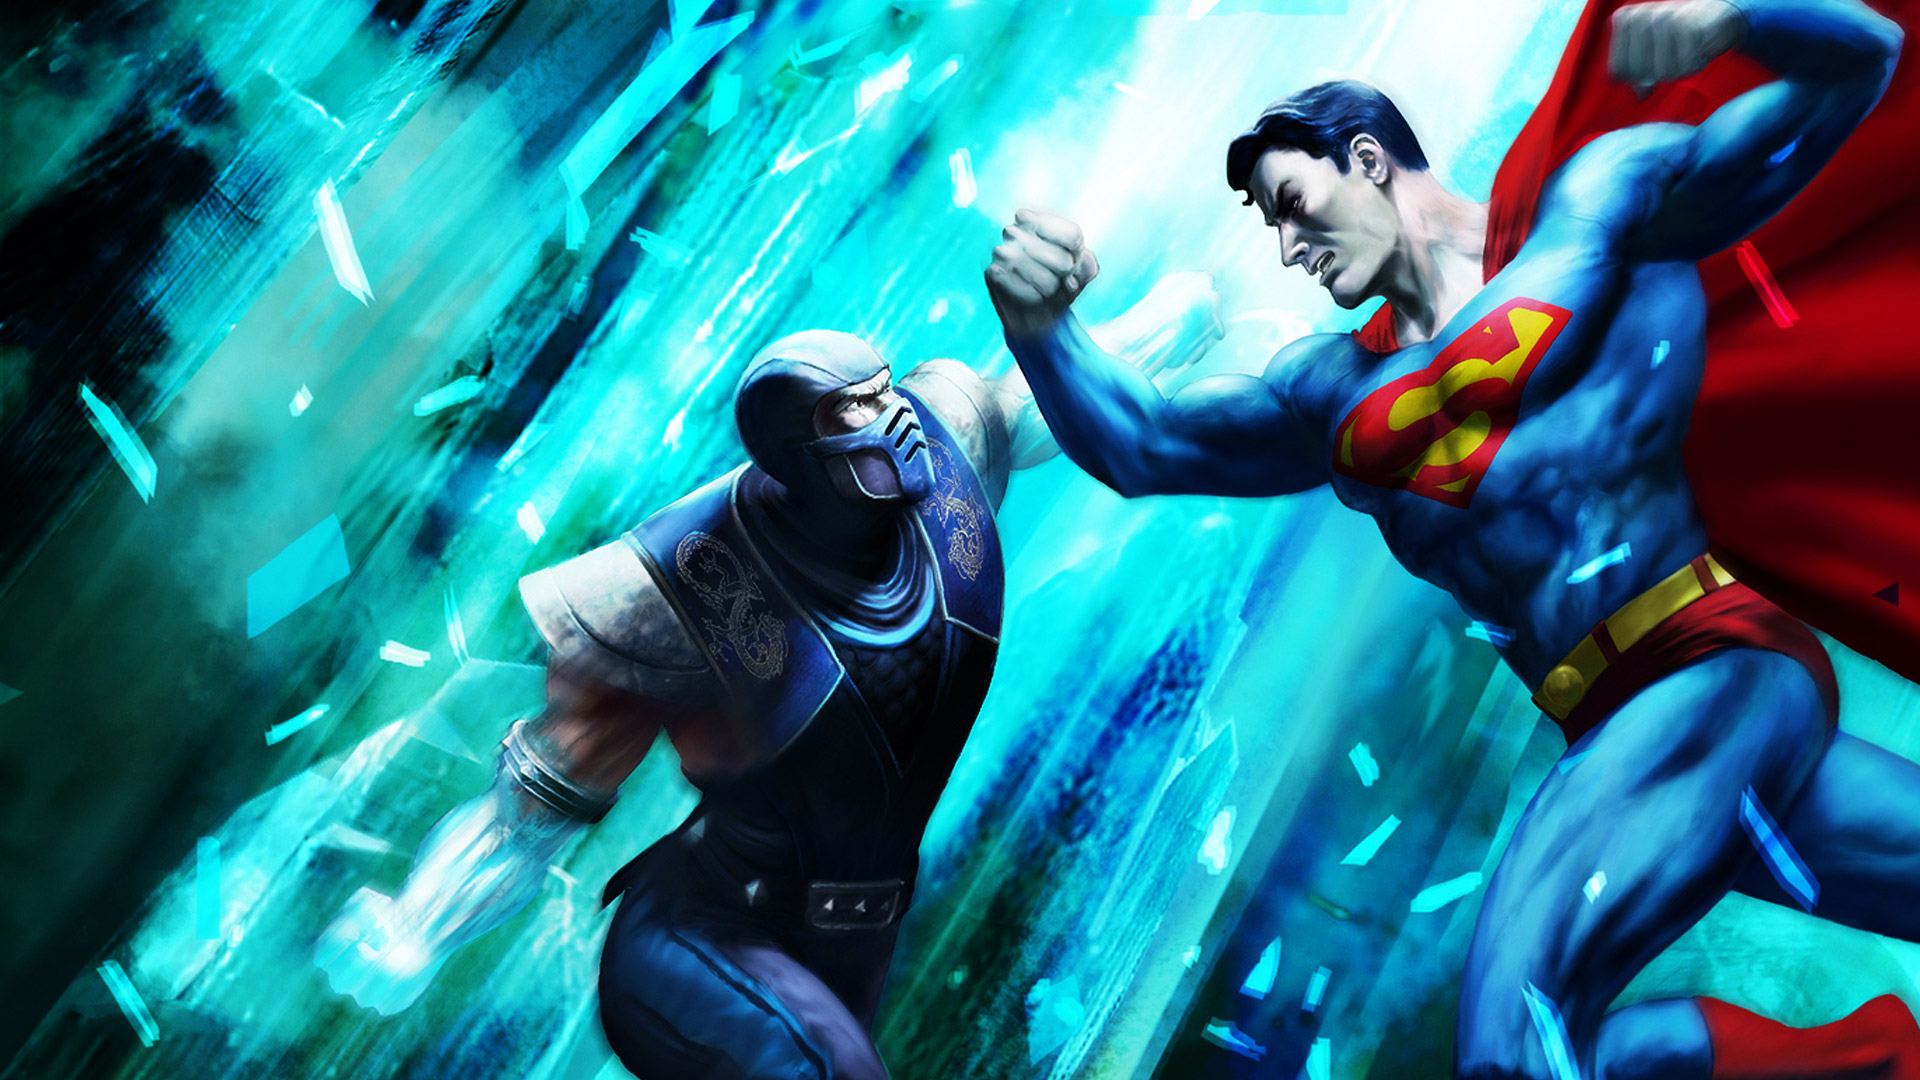 Mortal Kombat vs. DC Universe Wallpaper in 1920x1080